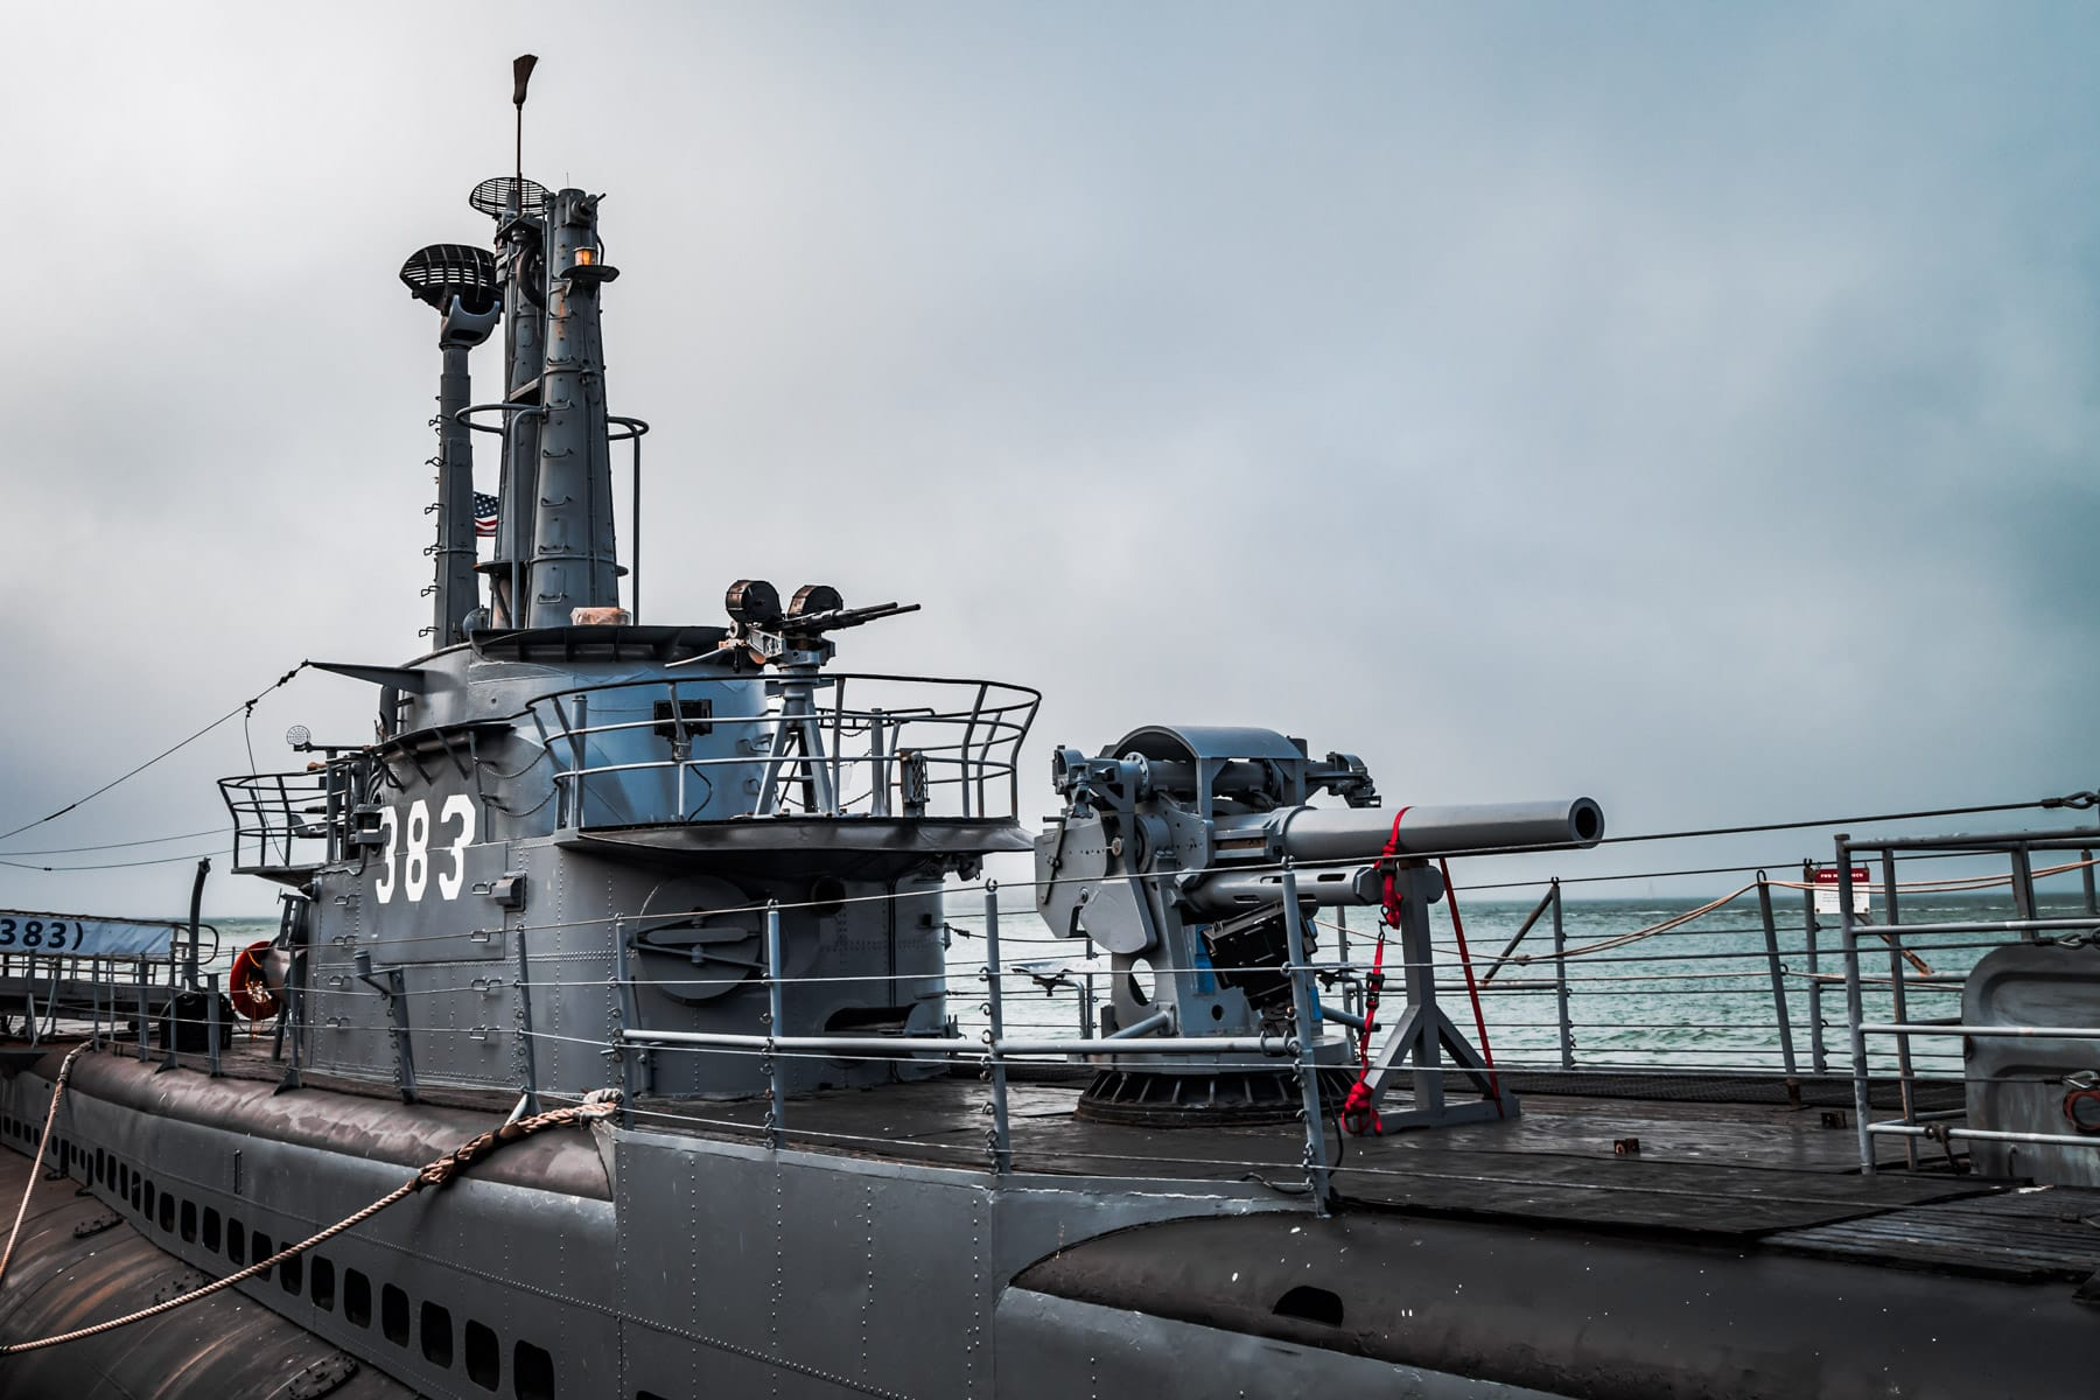 The gun deck of the World War II-era submarine USS Pampanito, now on display at San Francisco's Fisherman's Wharf.